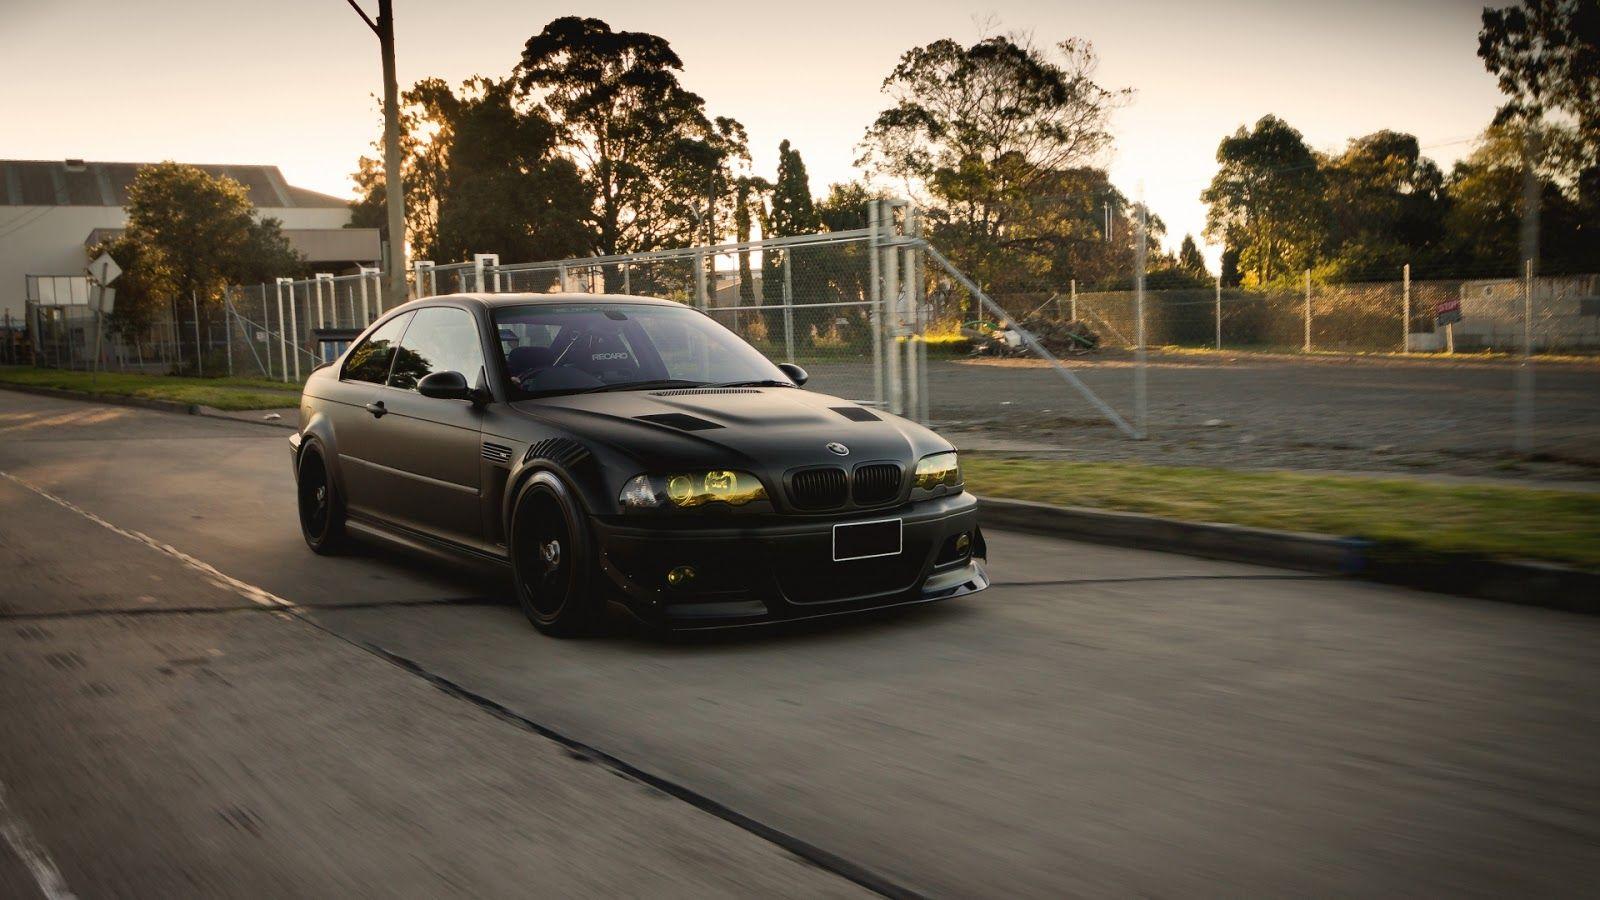 BMW Black M3 E46 Tuning   Full HD 1080p Cars Wallpapers Desktop 1600x900